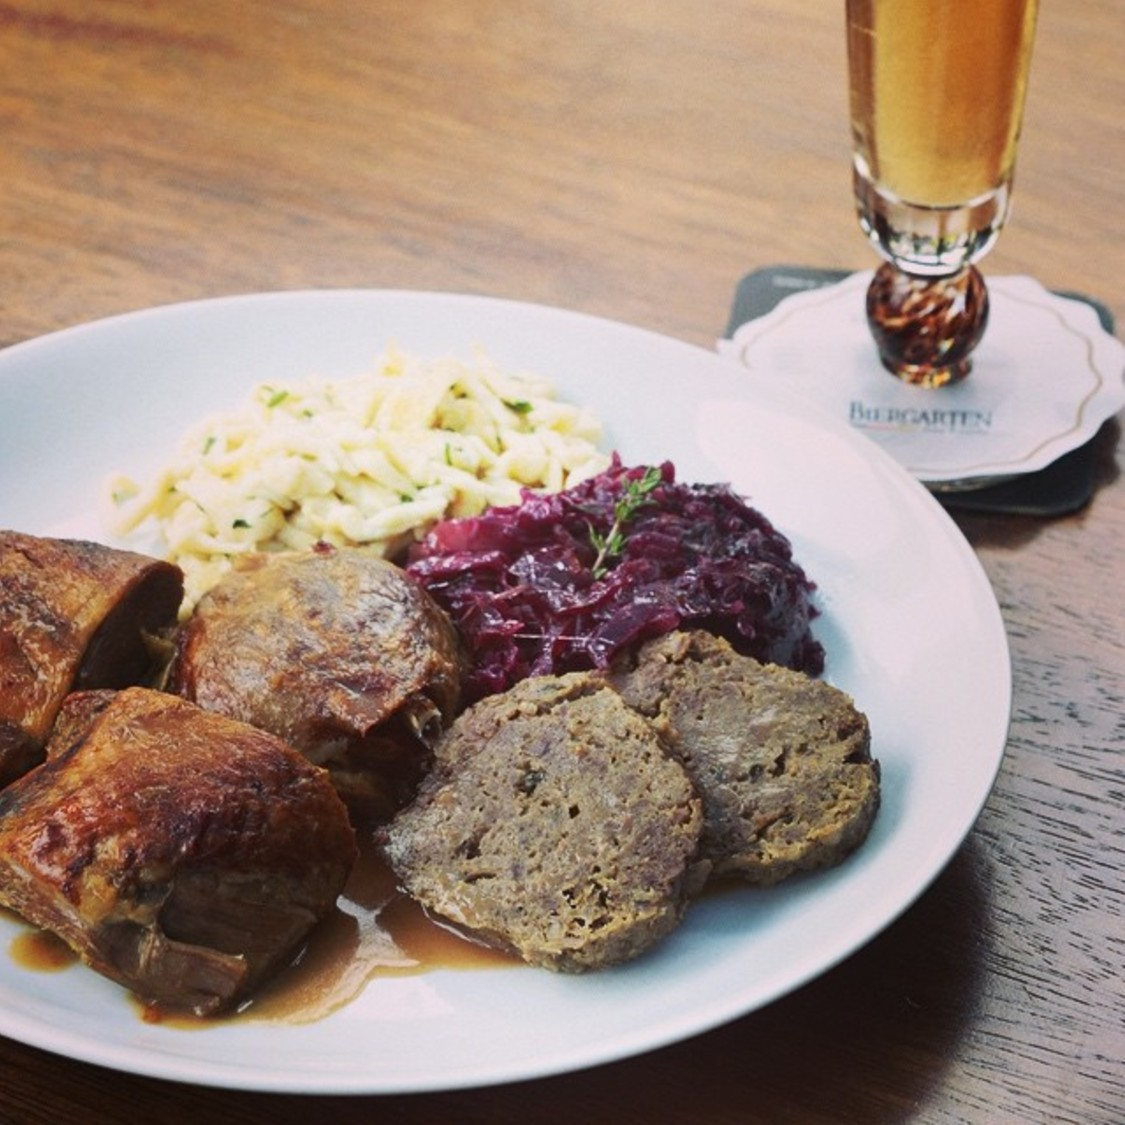 Biergarten Chopp & Cozinha